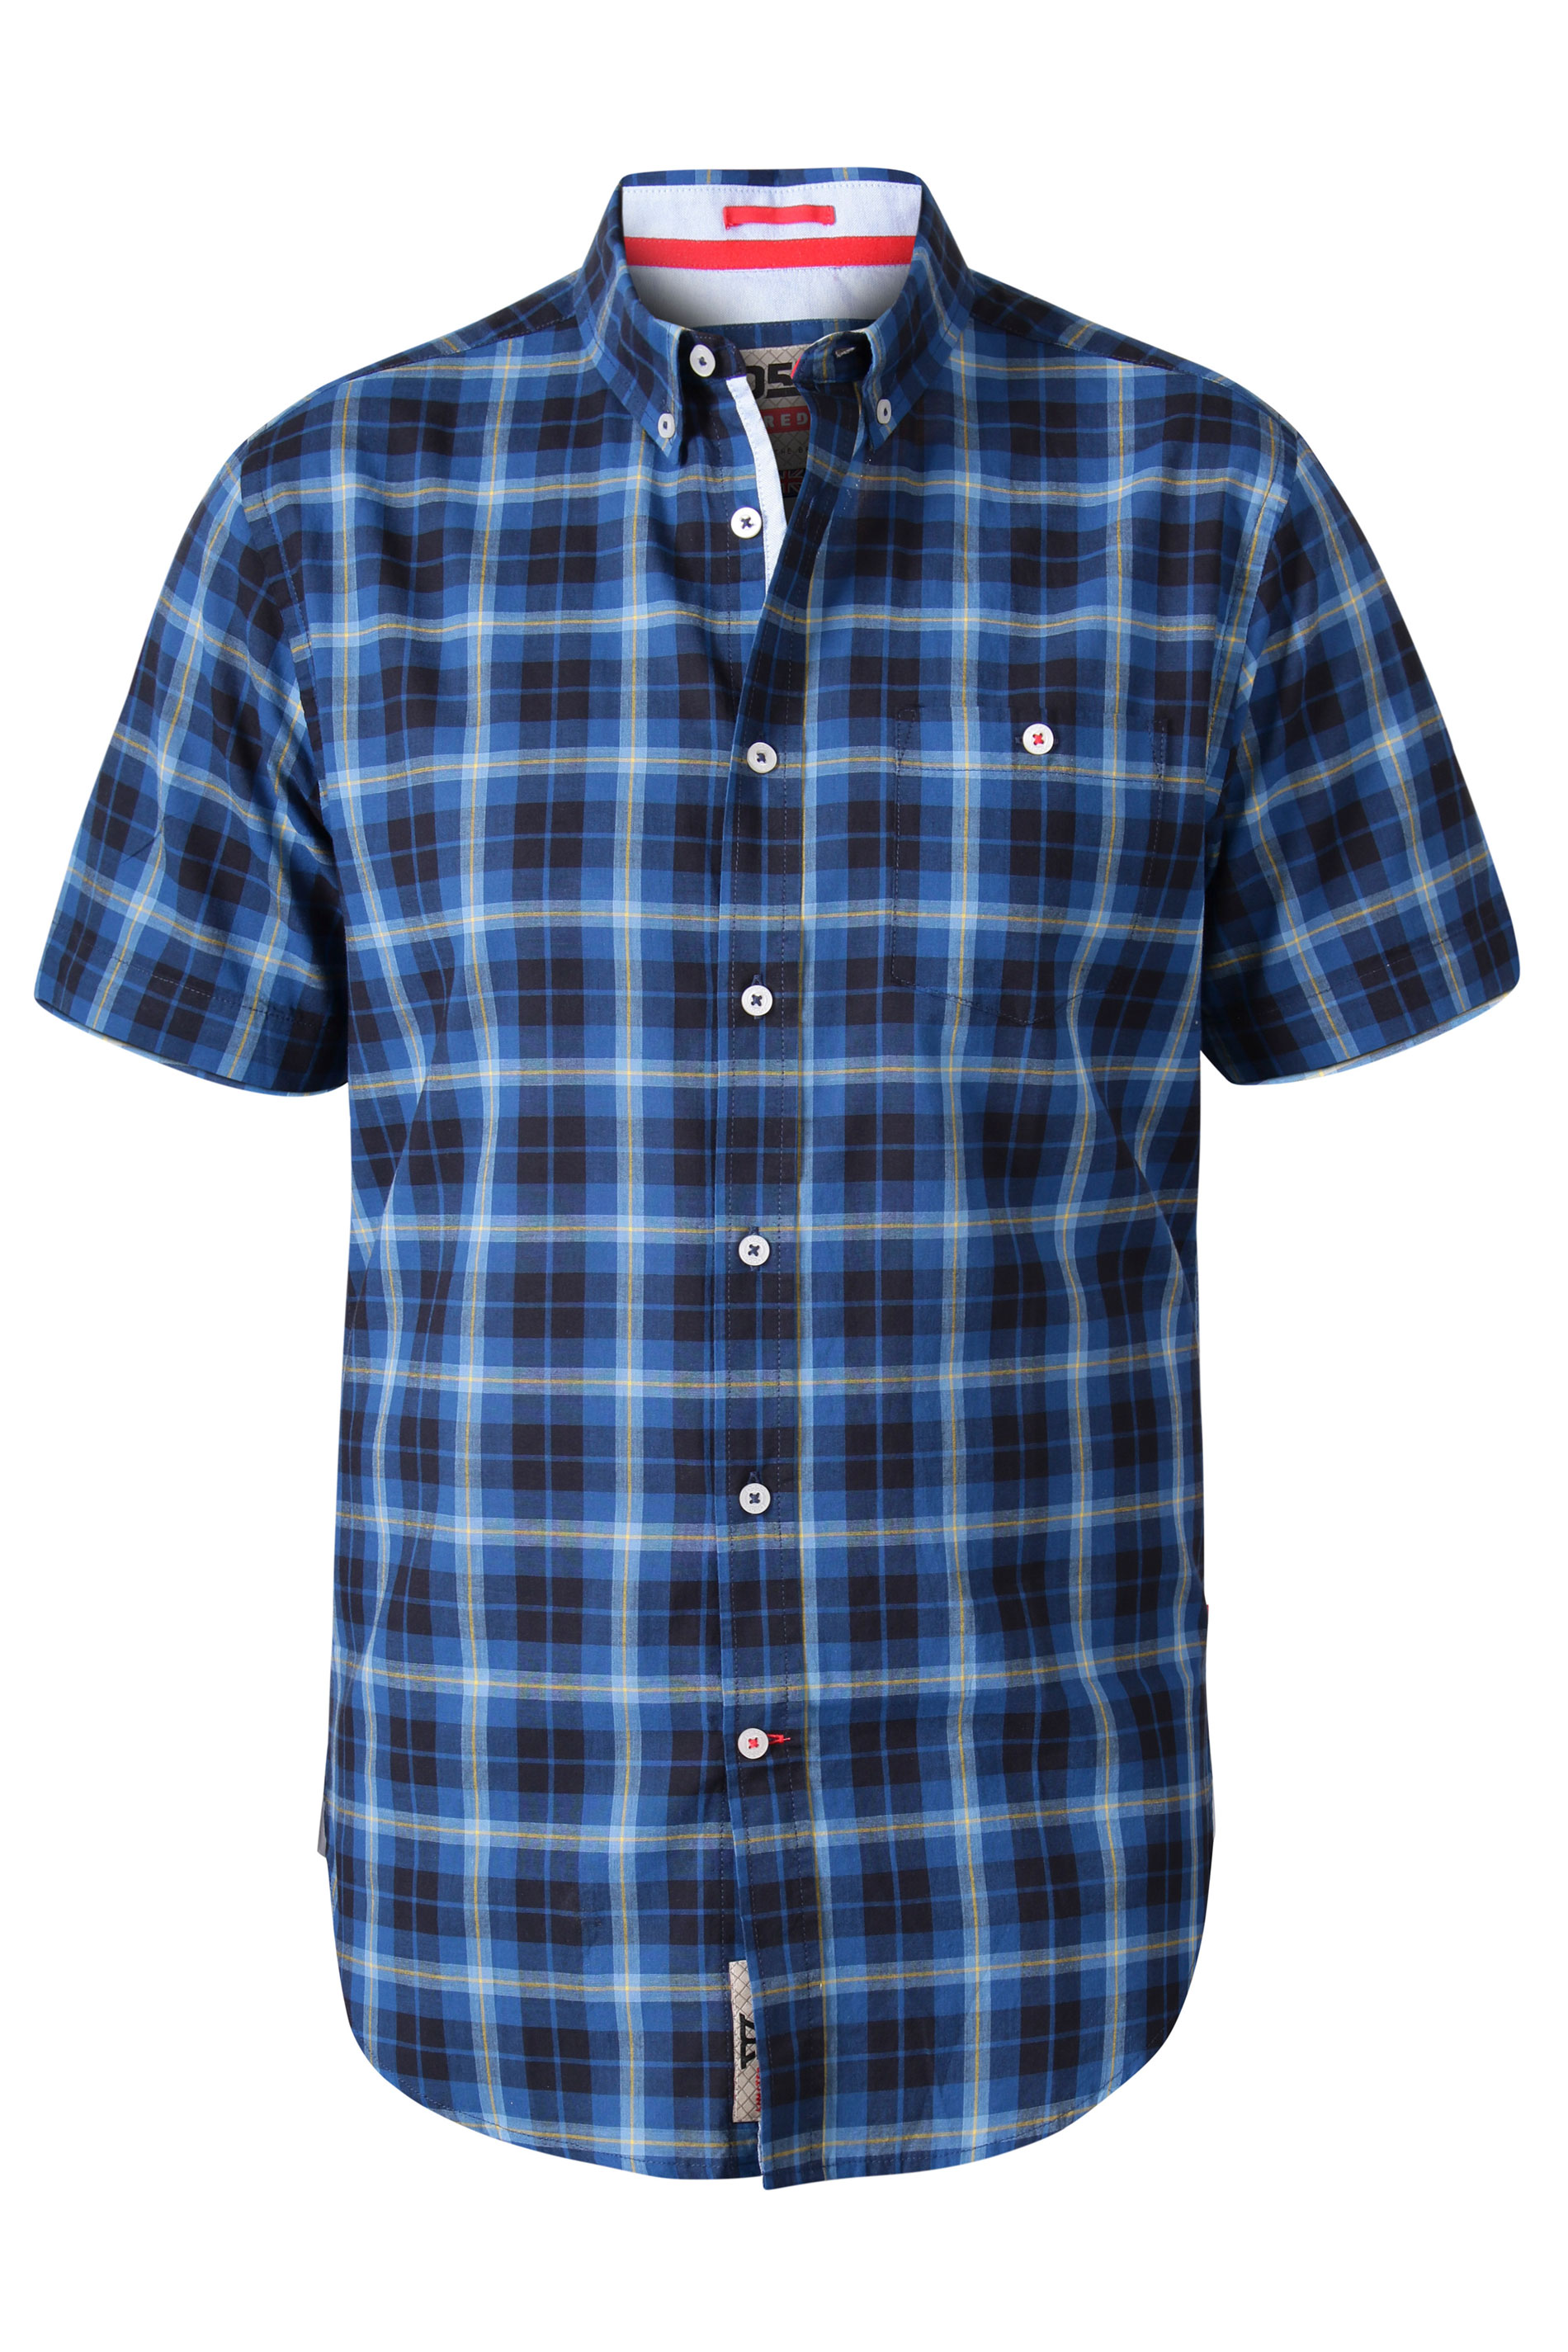 D555 Navy Check Short Sleeve Shirt